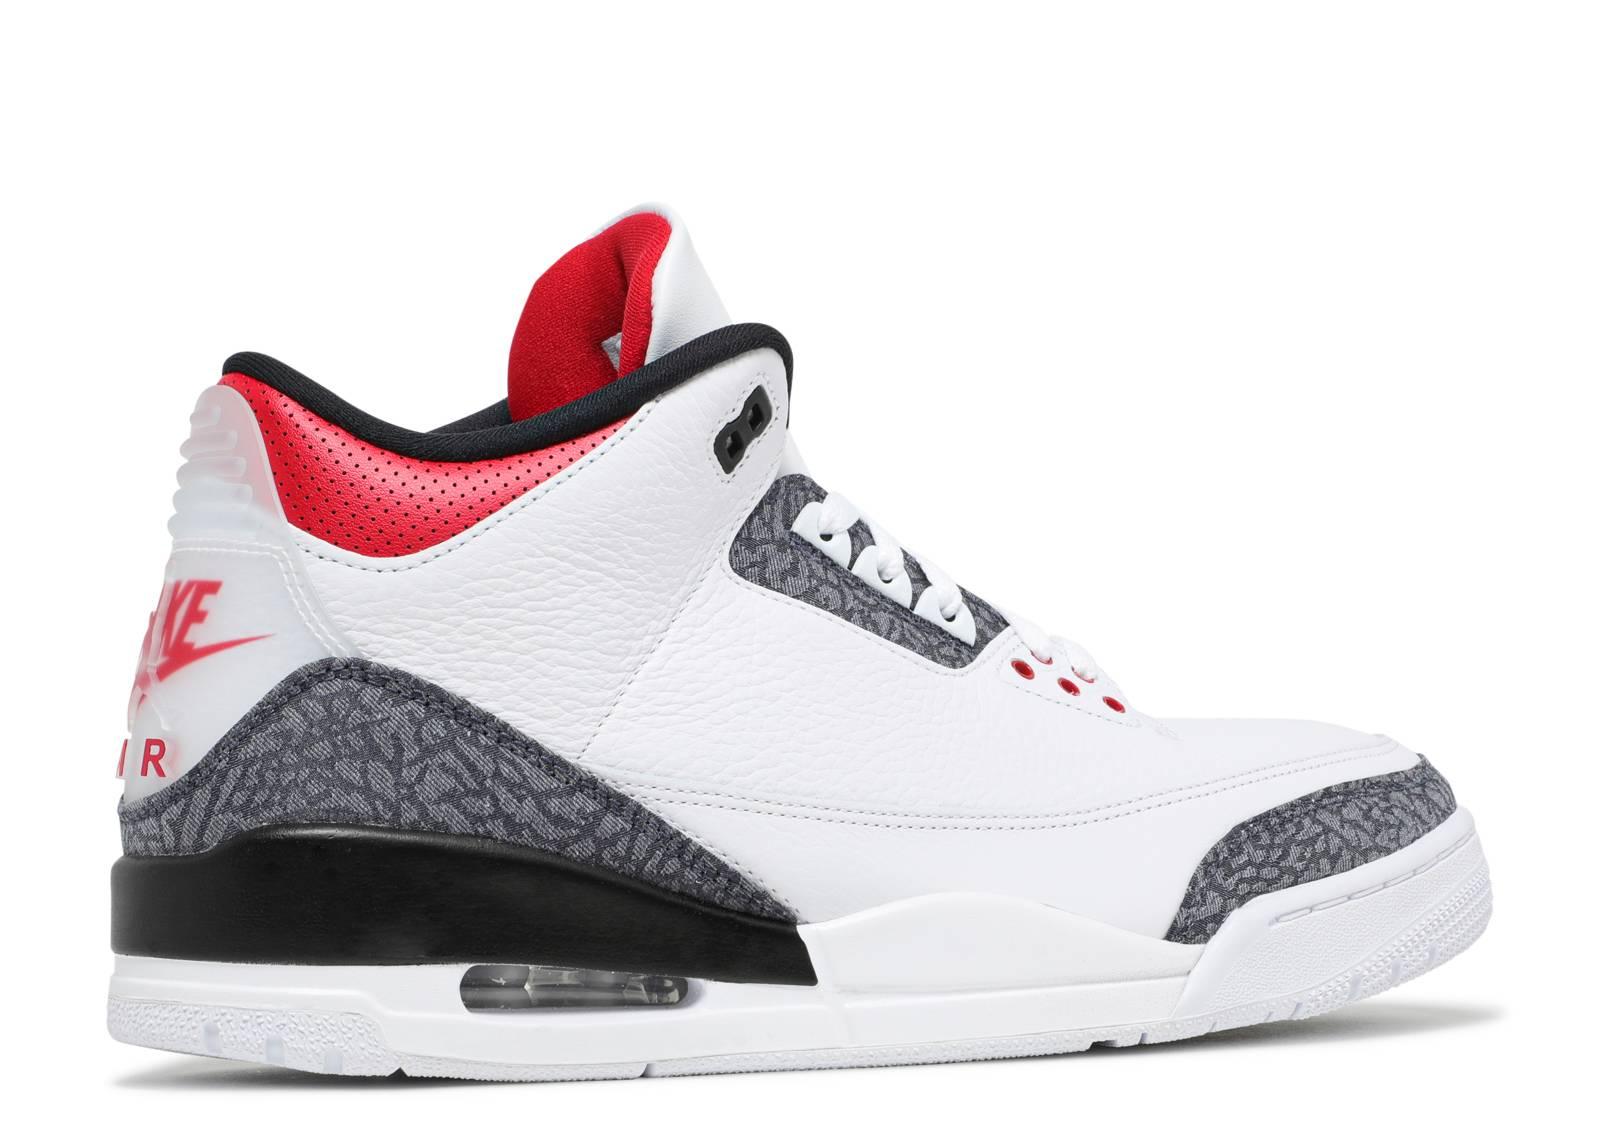 Air Jordan 3 Retro Denim SE 'Fire Red' - Air Jordan - CZ6431 100 ...